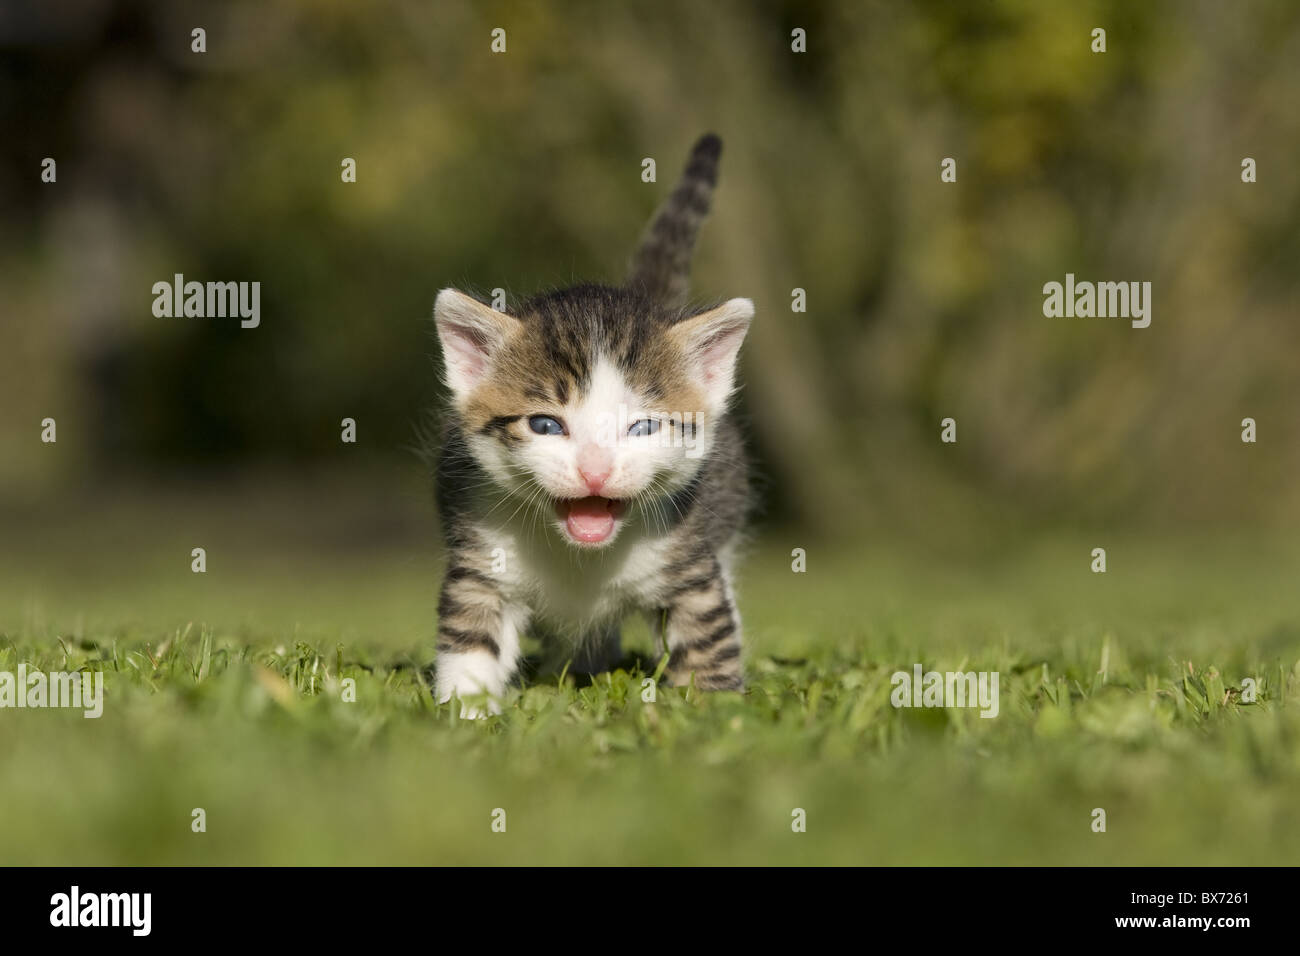 Katze, Kaetzchen miauend, lachend auf Wiese, Cat, kitten laughing, miaowing on a meadow Stock Photo